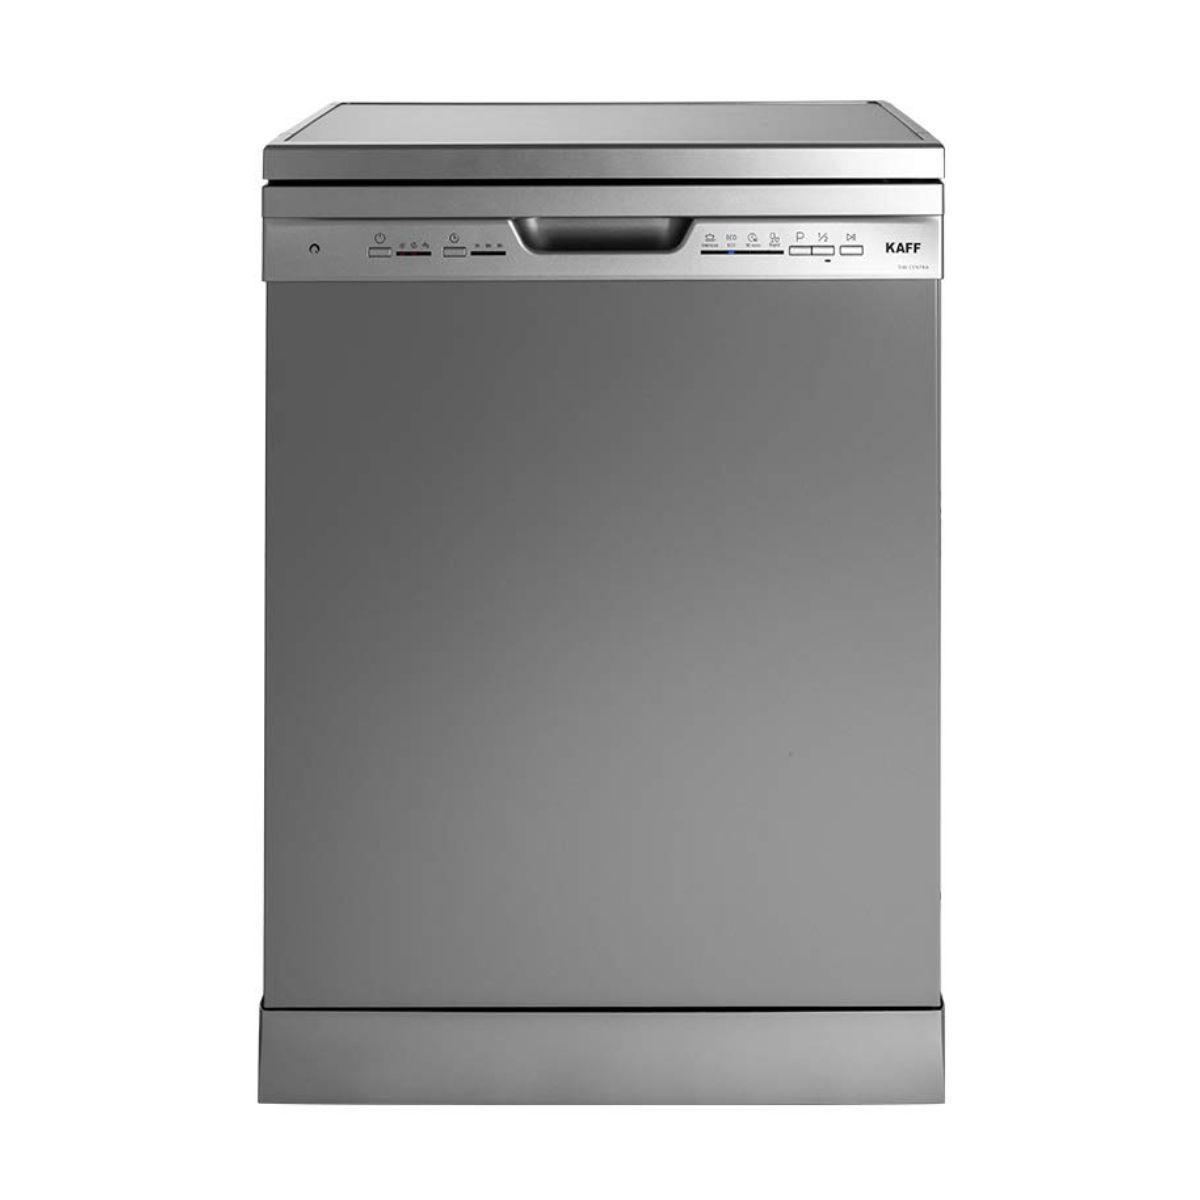 KAFF DW Centra 60 dishwasher